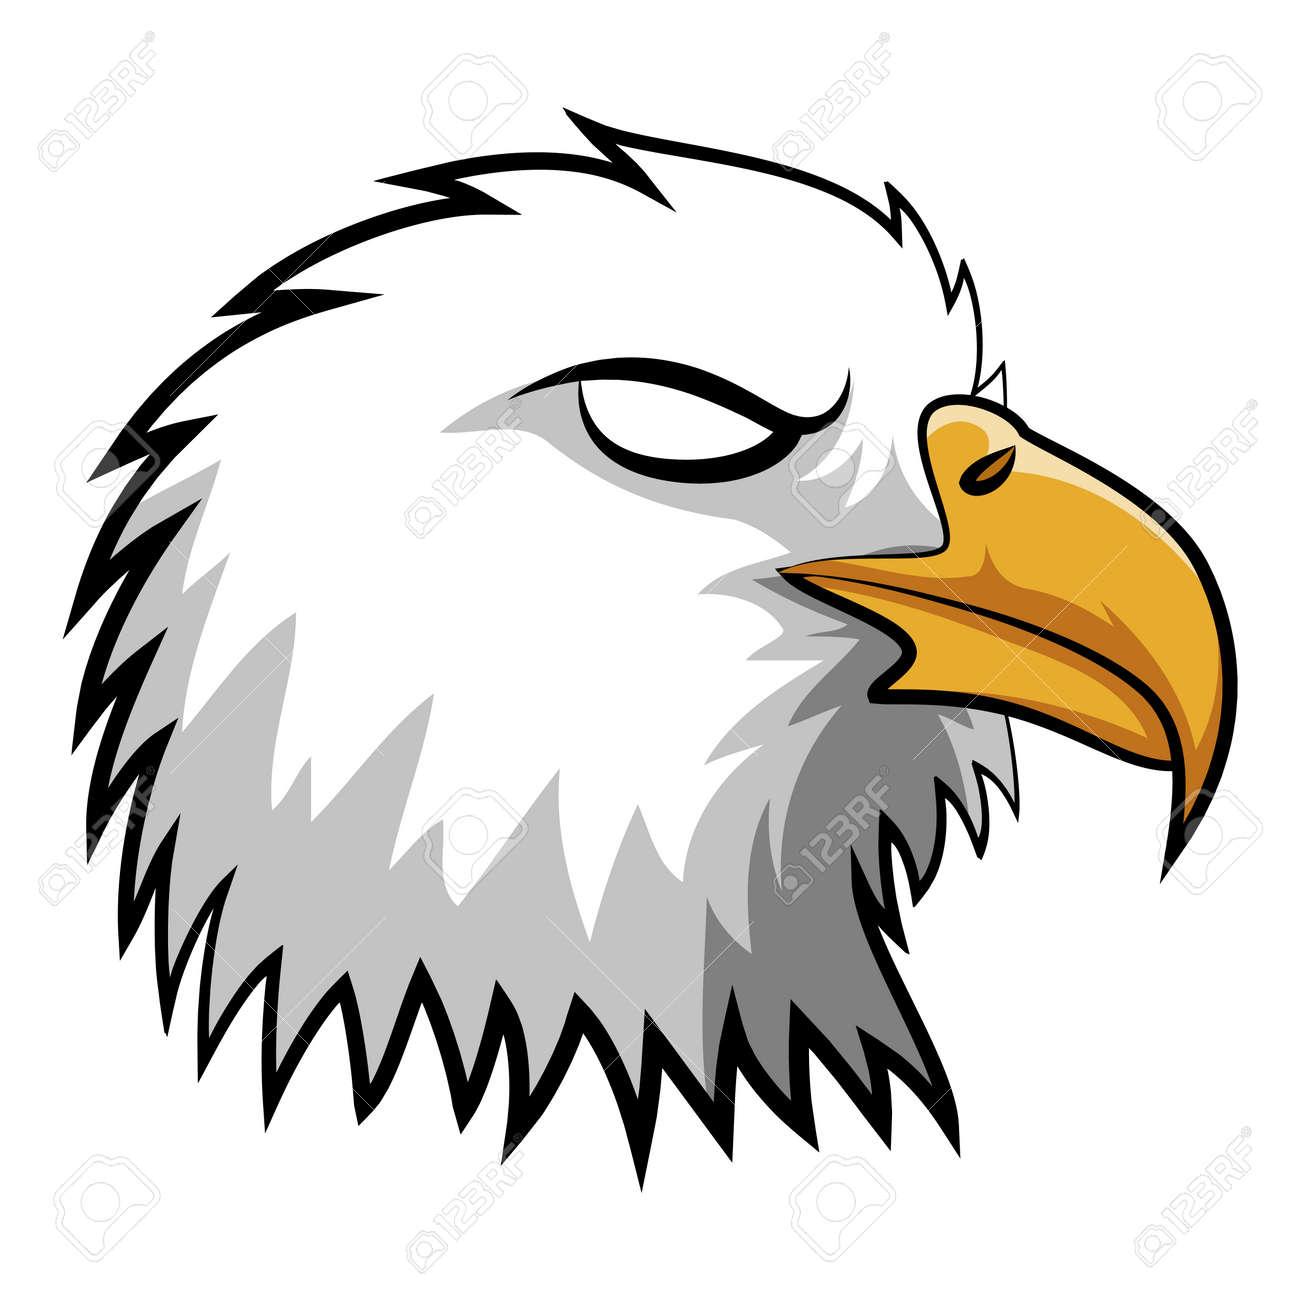 Angry Eagle Head Mascot Royalty Free Cliparts Vectors And Stock